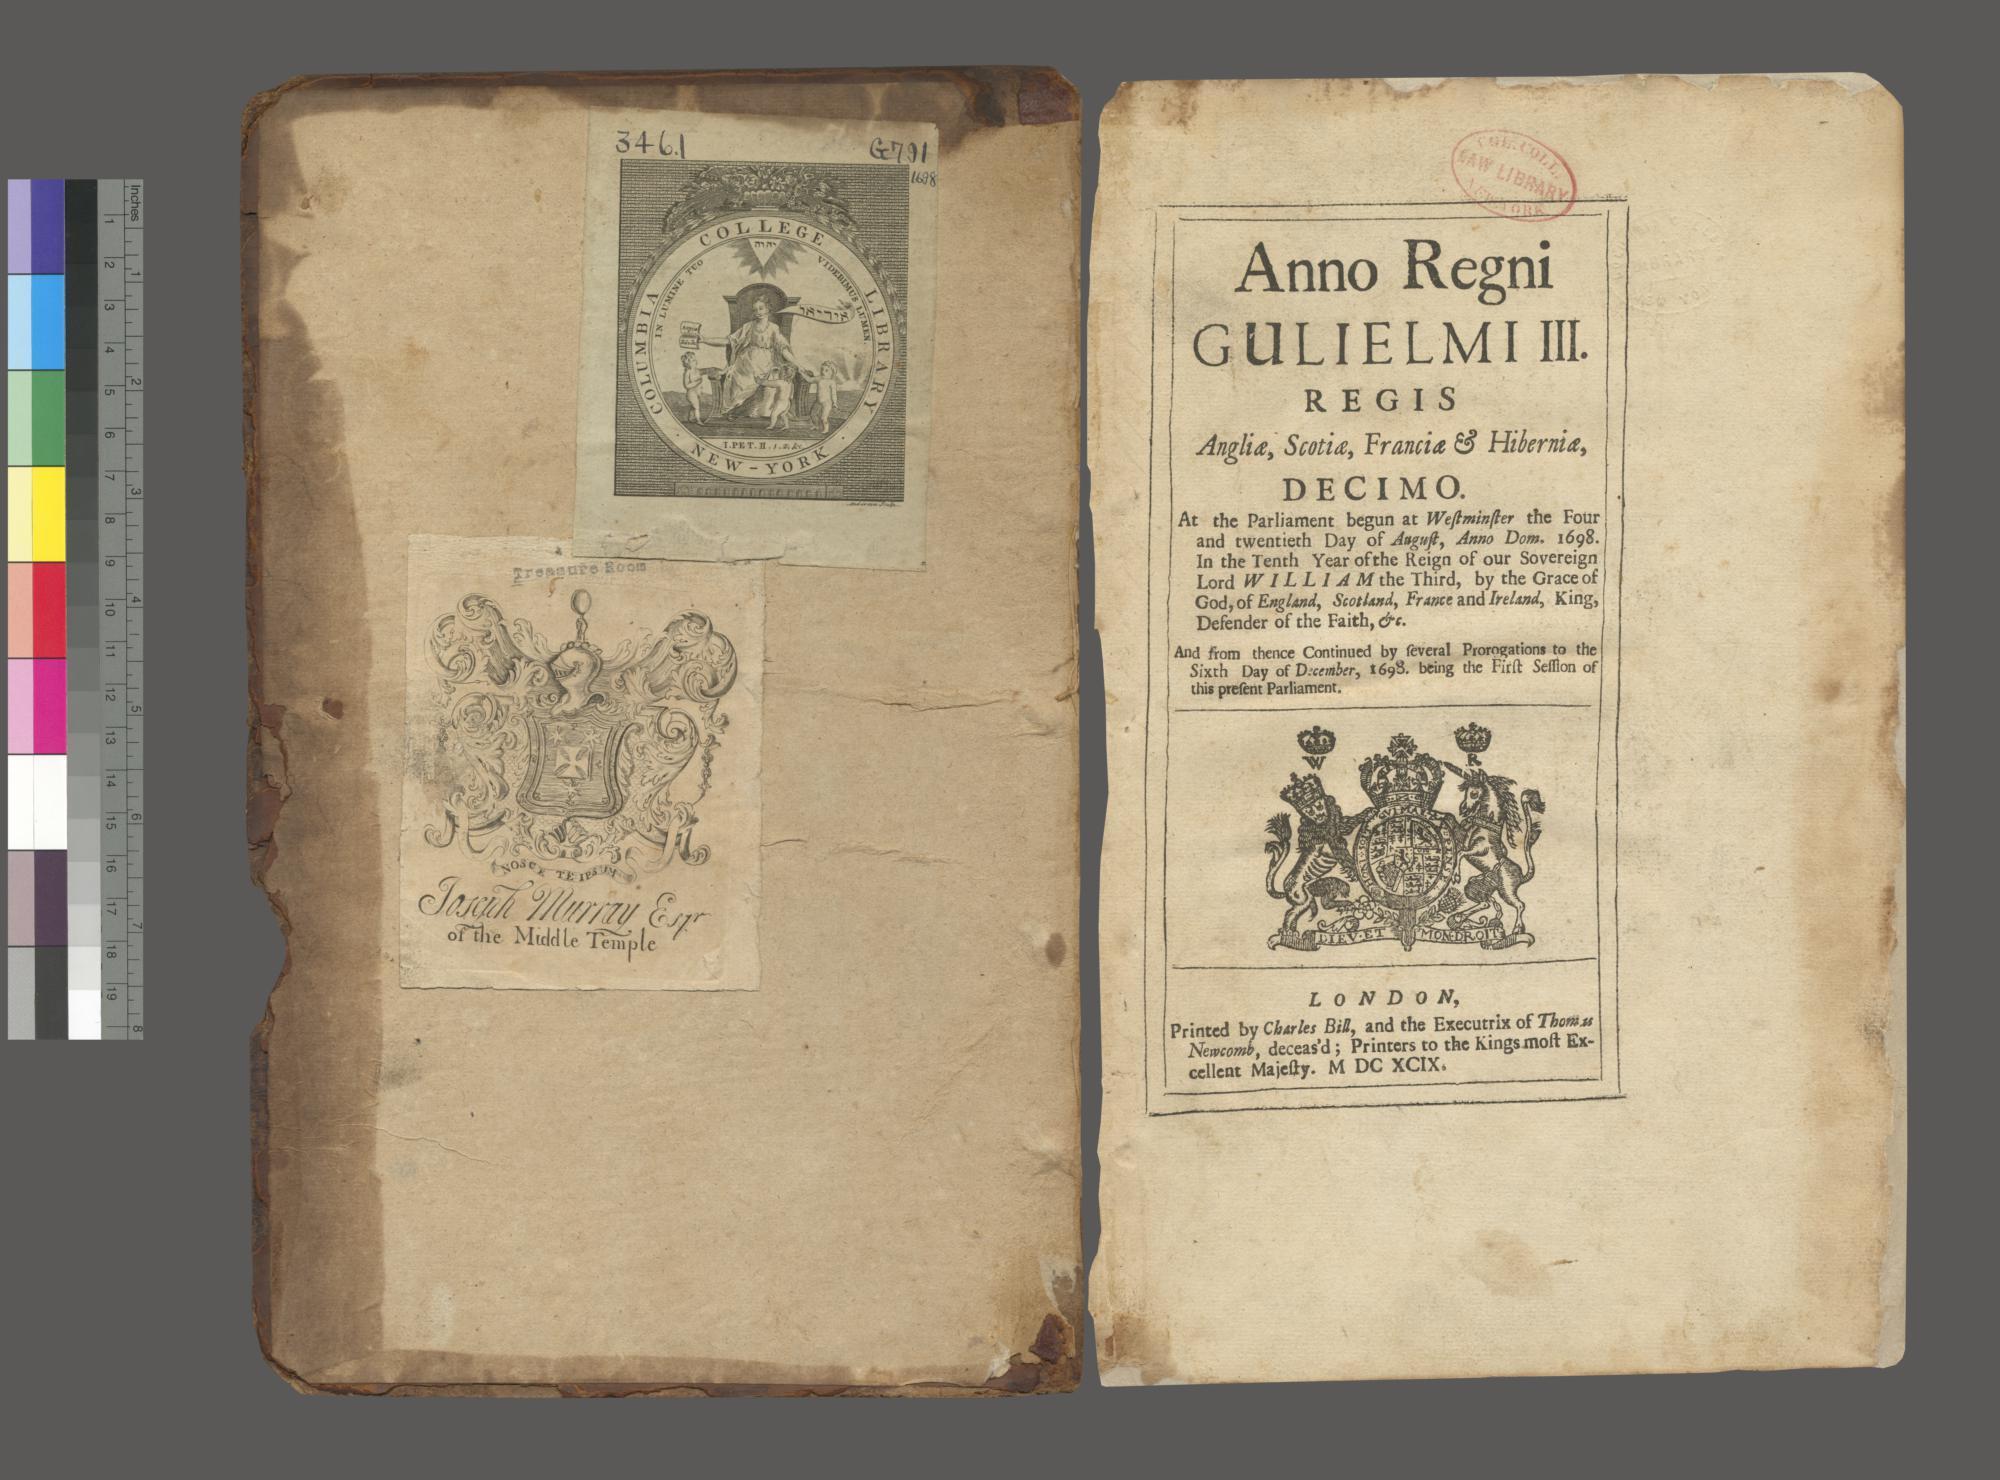 Anno regni Gulielmi III Regis Angliae, Scotiae, Franciae & Hiberniae, Decimo